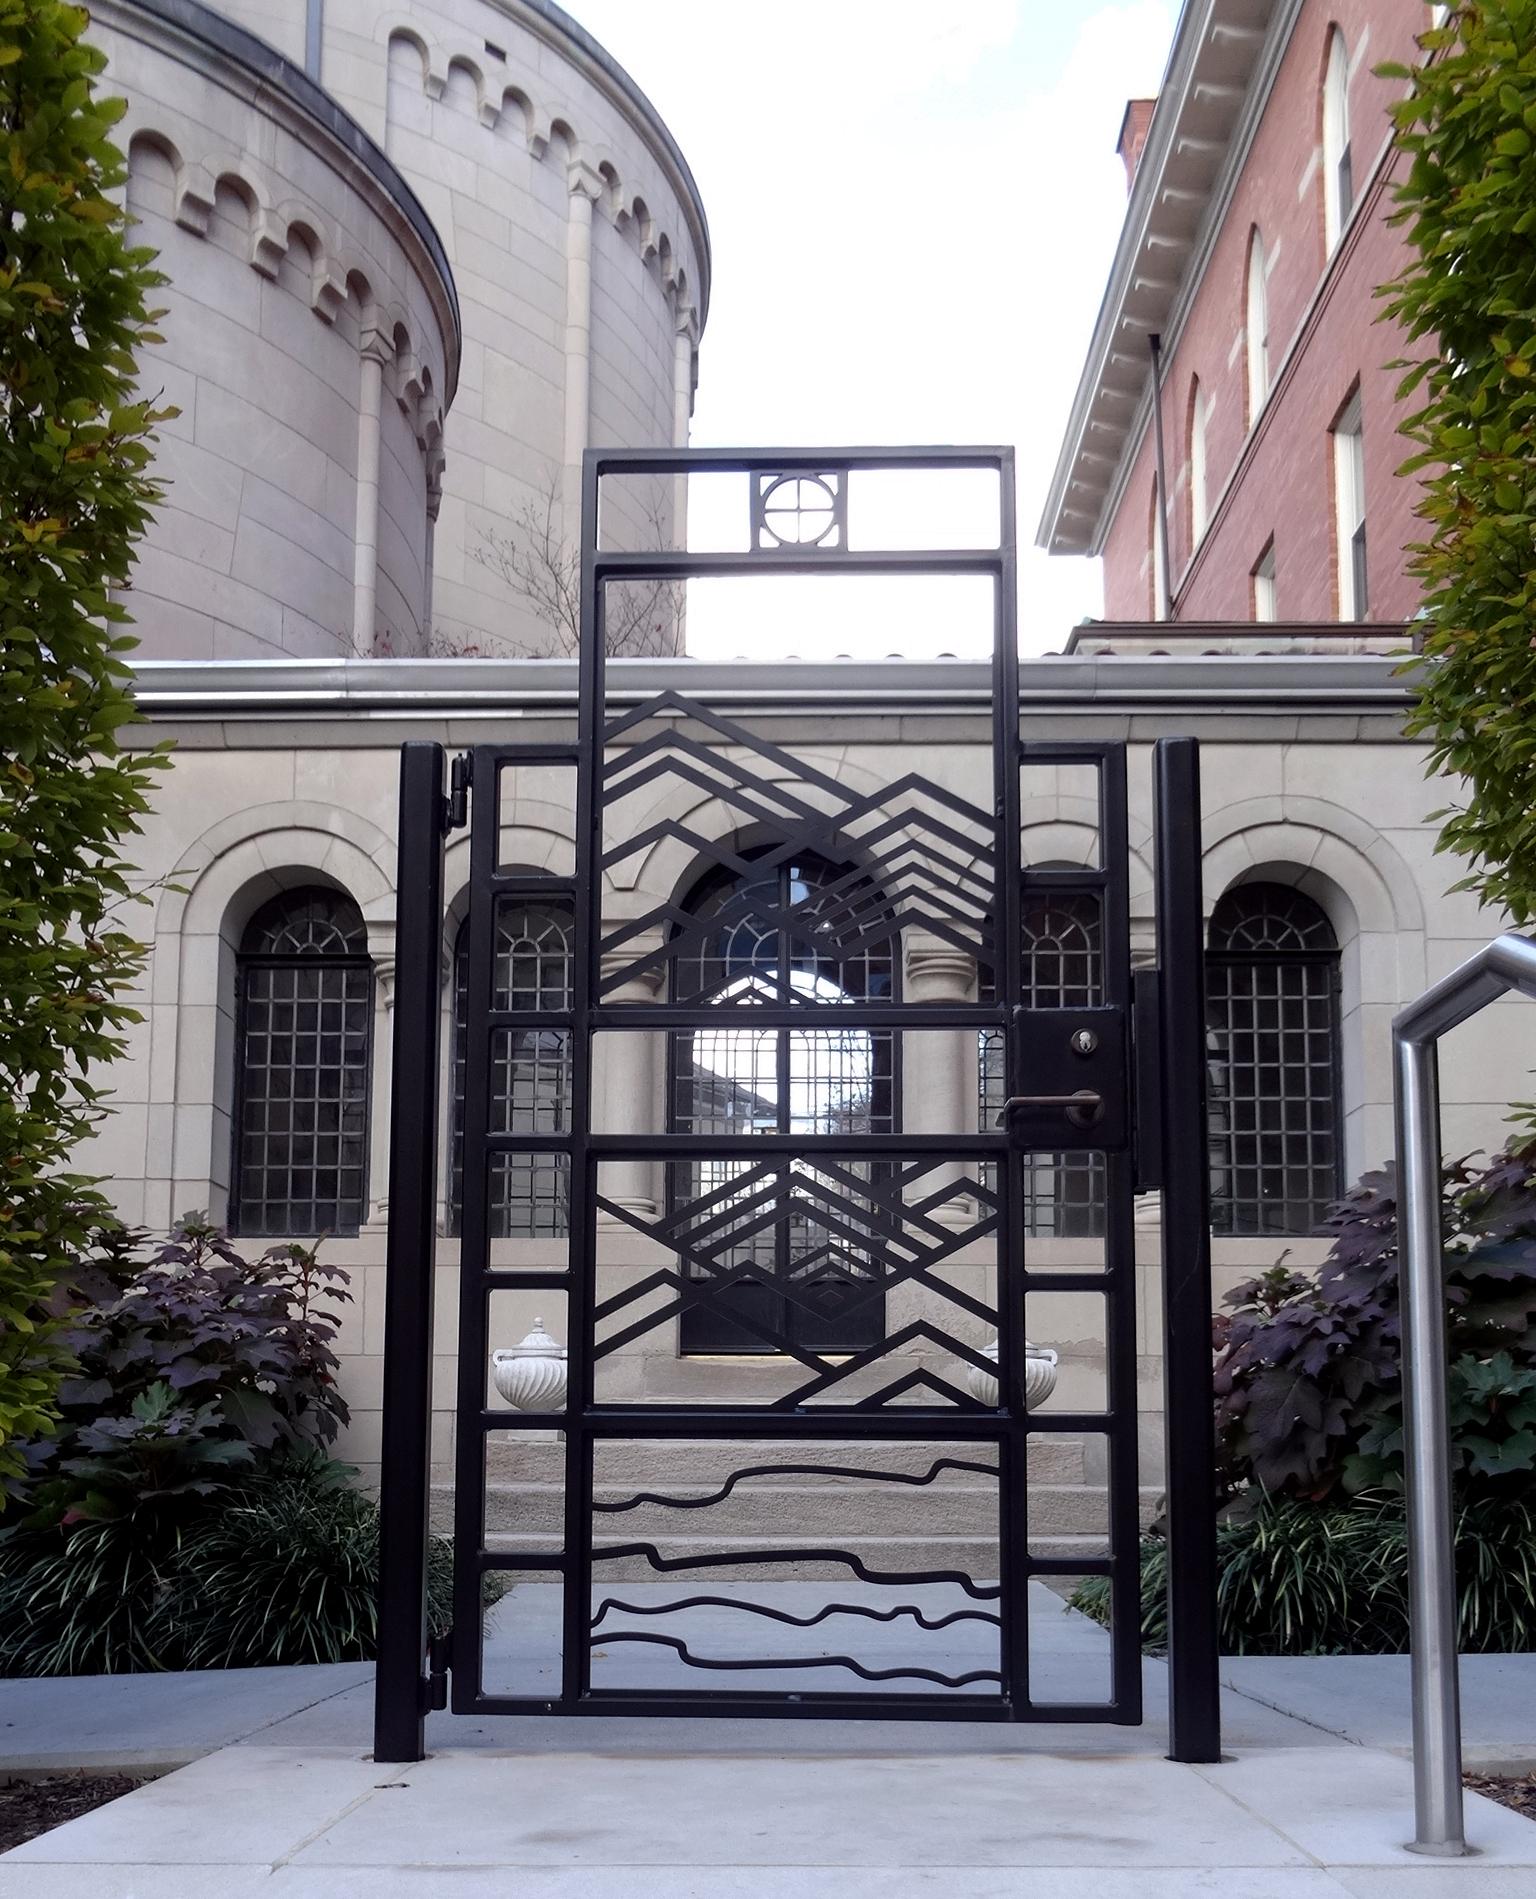 Catholic Campus Gate